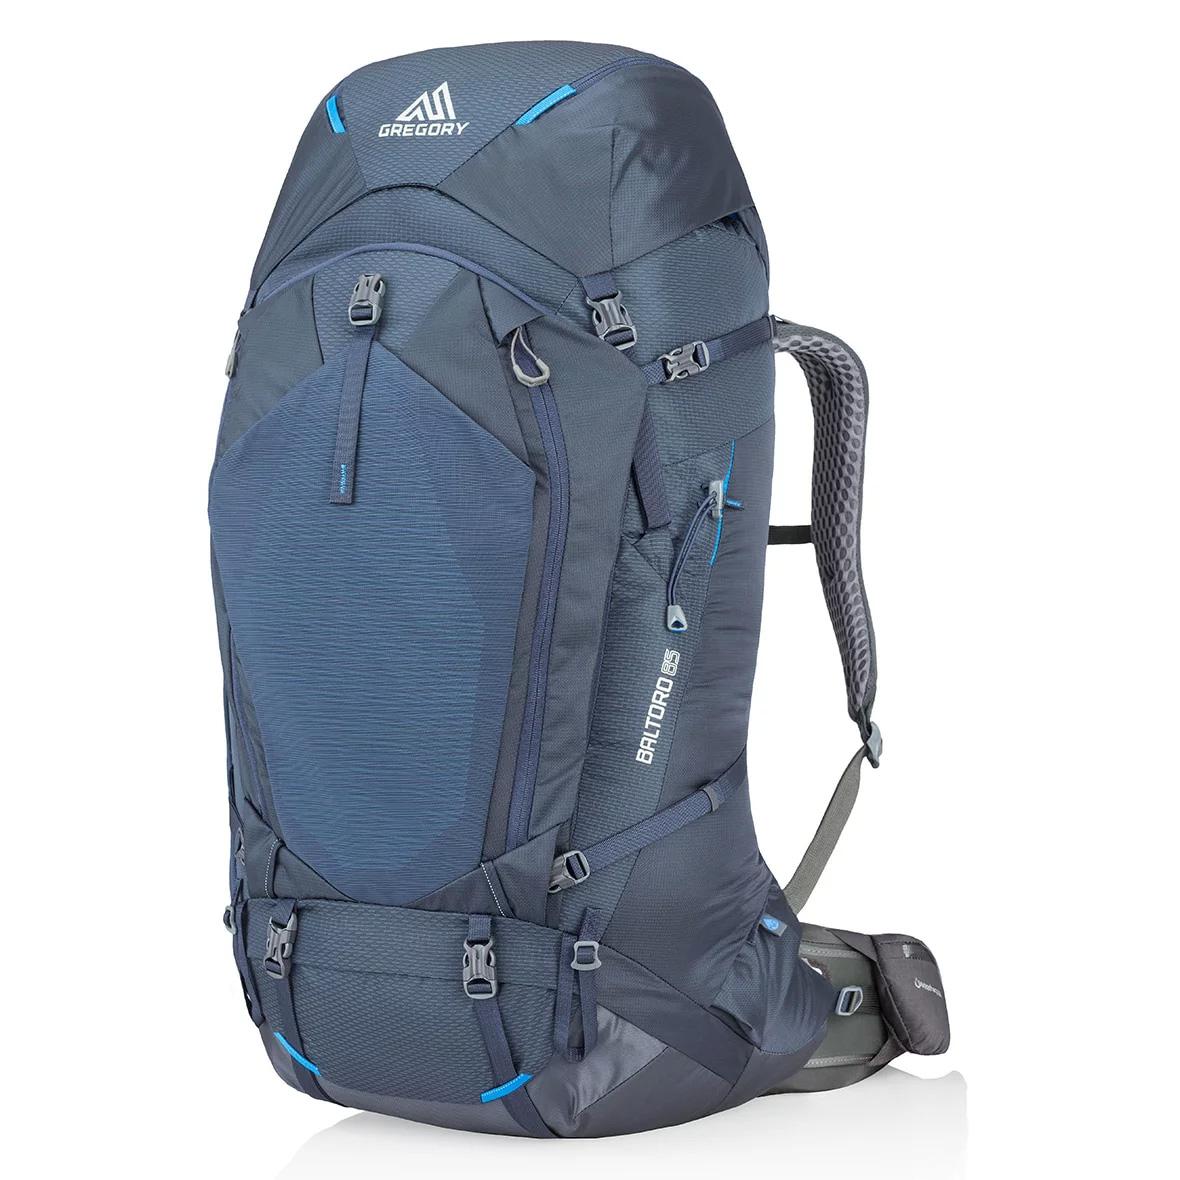 GREGORY(グレゴリー) 916166398 バルトロ85 80L/S リュック ザック バックパック 大容量 登山 アウトドア